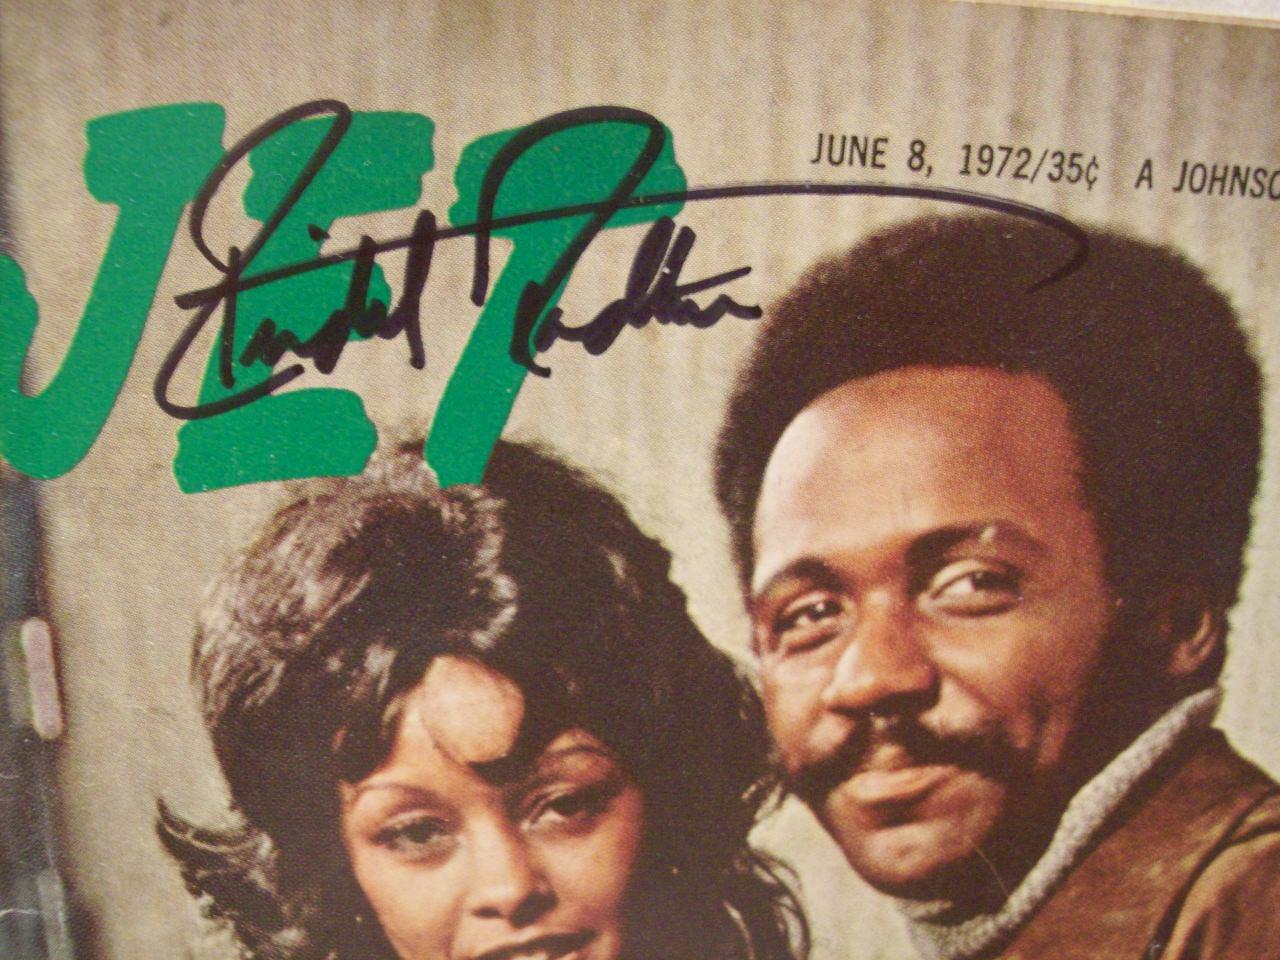 Roundtree, Richard Jet Magazine Signed Autograph 1972